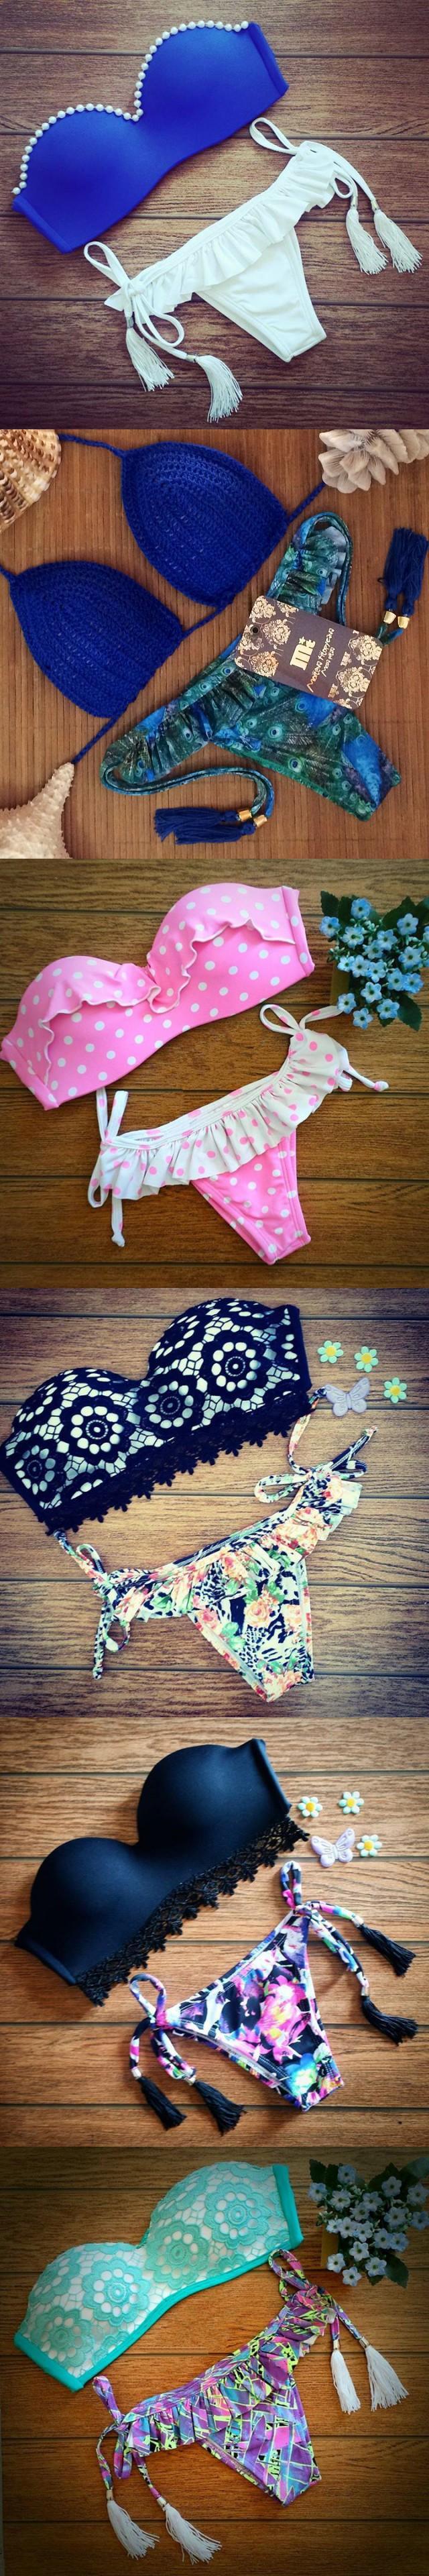 The 2015 Summer Triangle Bikini suit swimwear gather Bikini Brazil Vintage Lace fashion sexy swimsuit free shipping $17.15